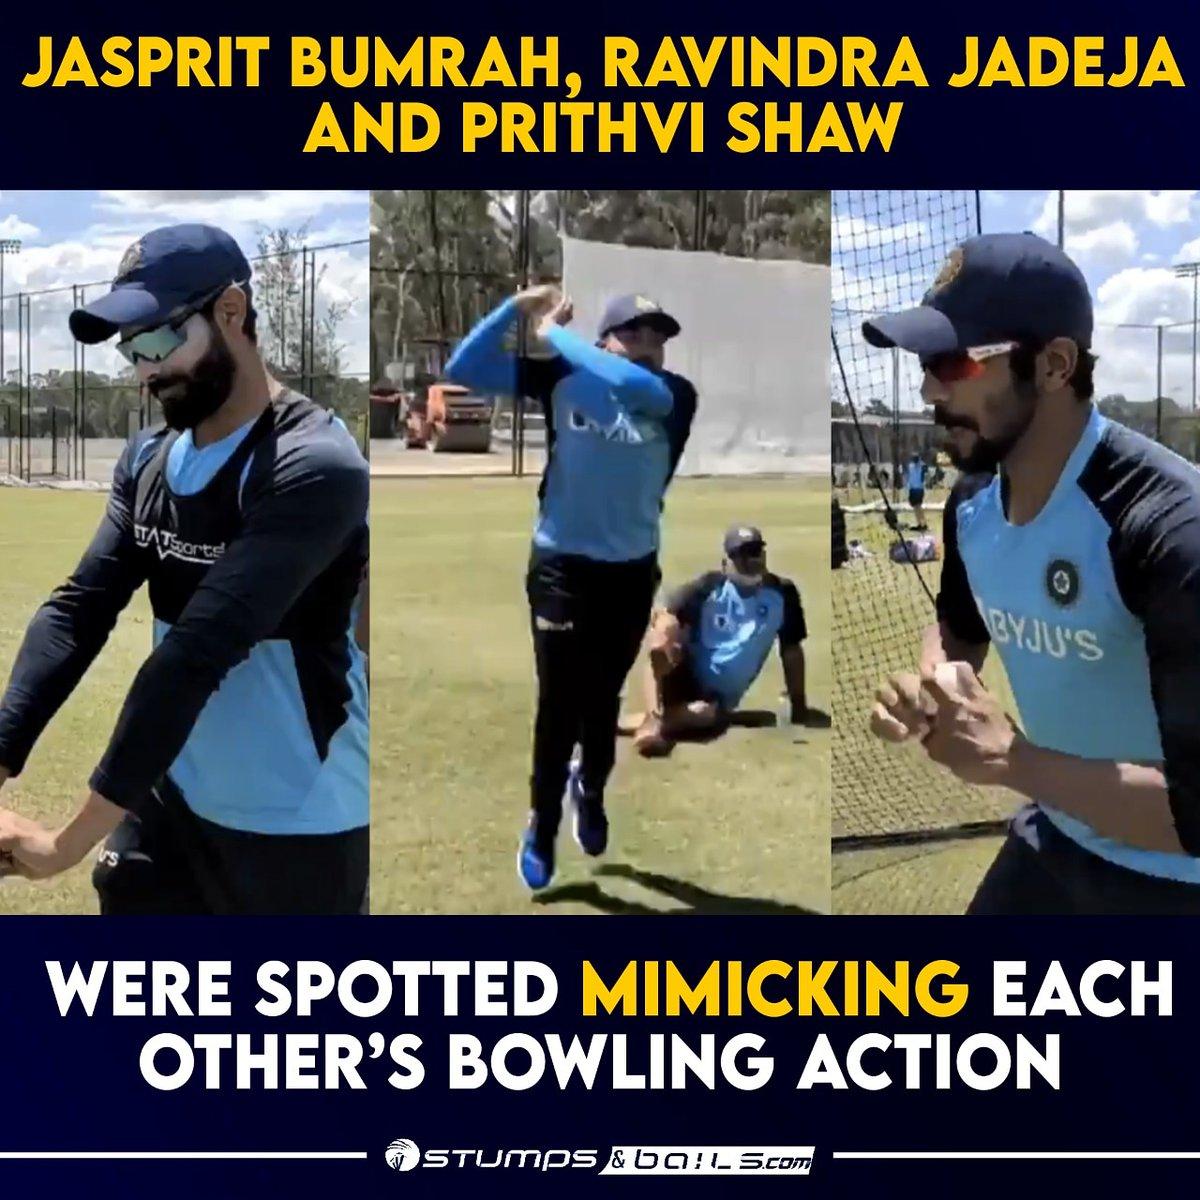 #TeamIndia having funtime in #Australia 😂👏  Follow us @stumpnbails #Indiancricketer #IndianCricketTeam #Cricket #Indiatourofaustralia  #indiatoaustralia #INDvsAus #indiavsaustralia #JaspritBumrah #RavindraJadeja #PrithviShaw